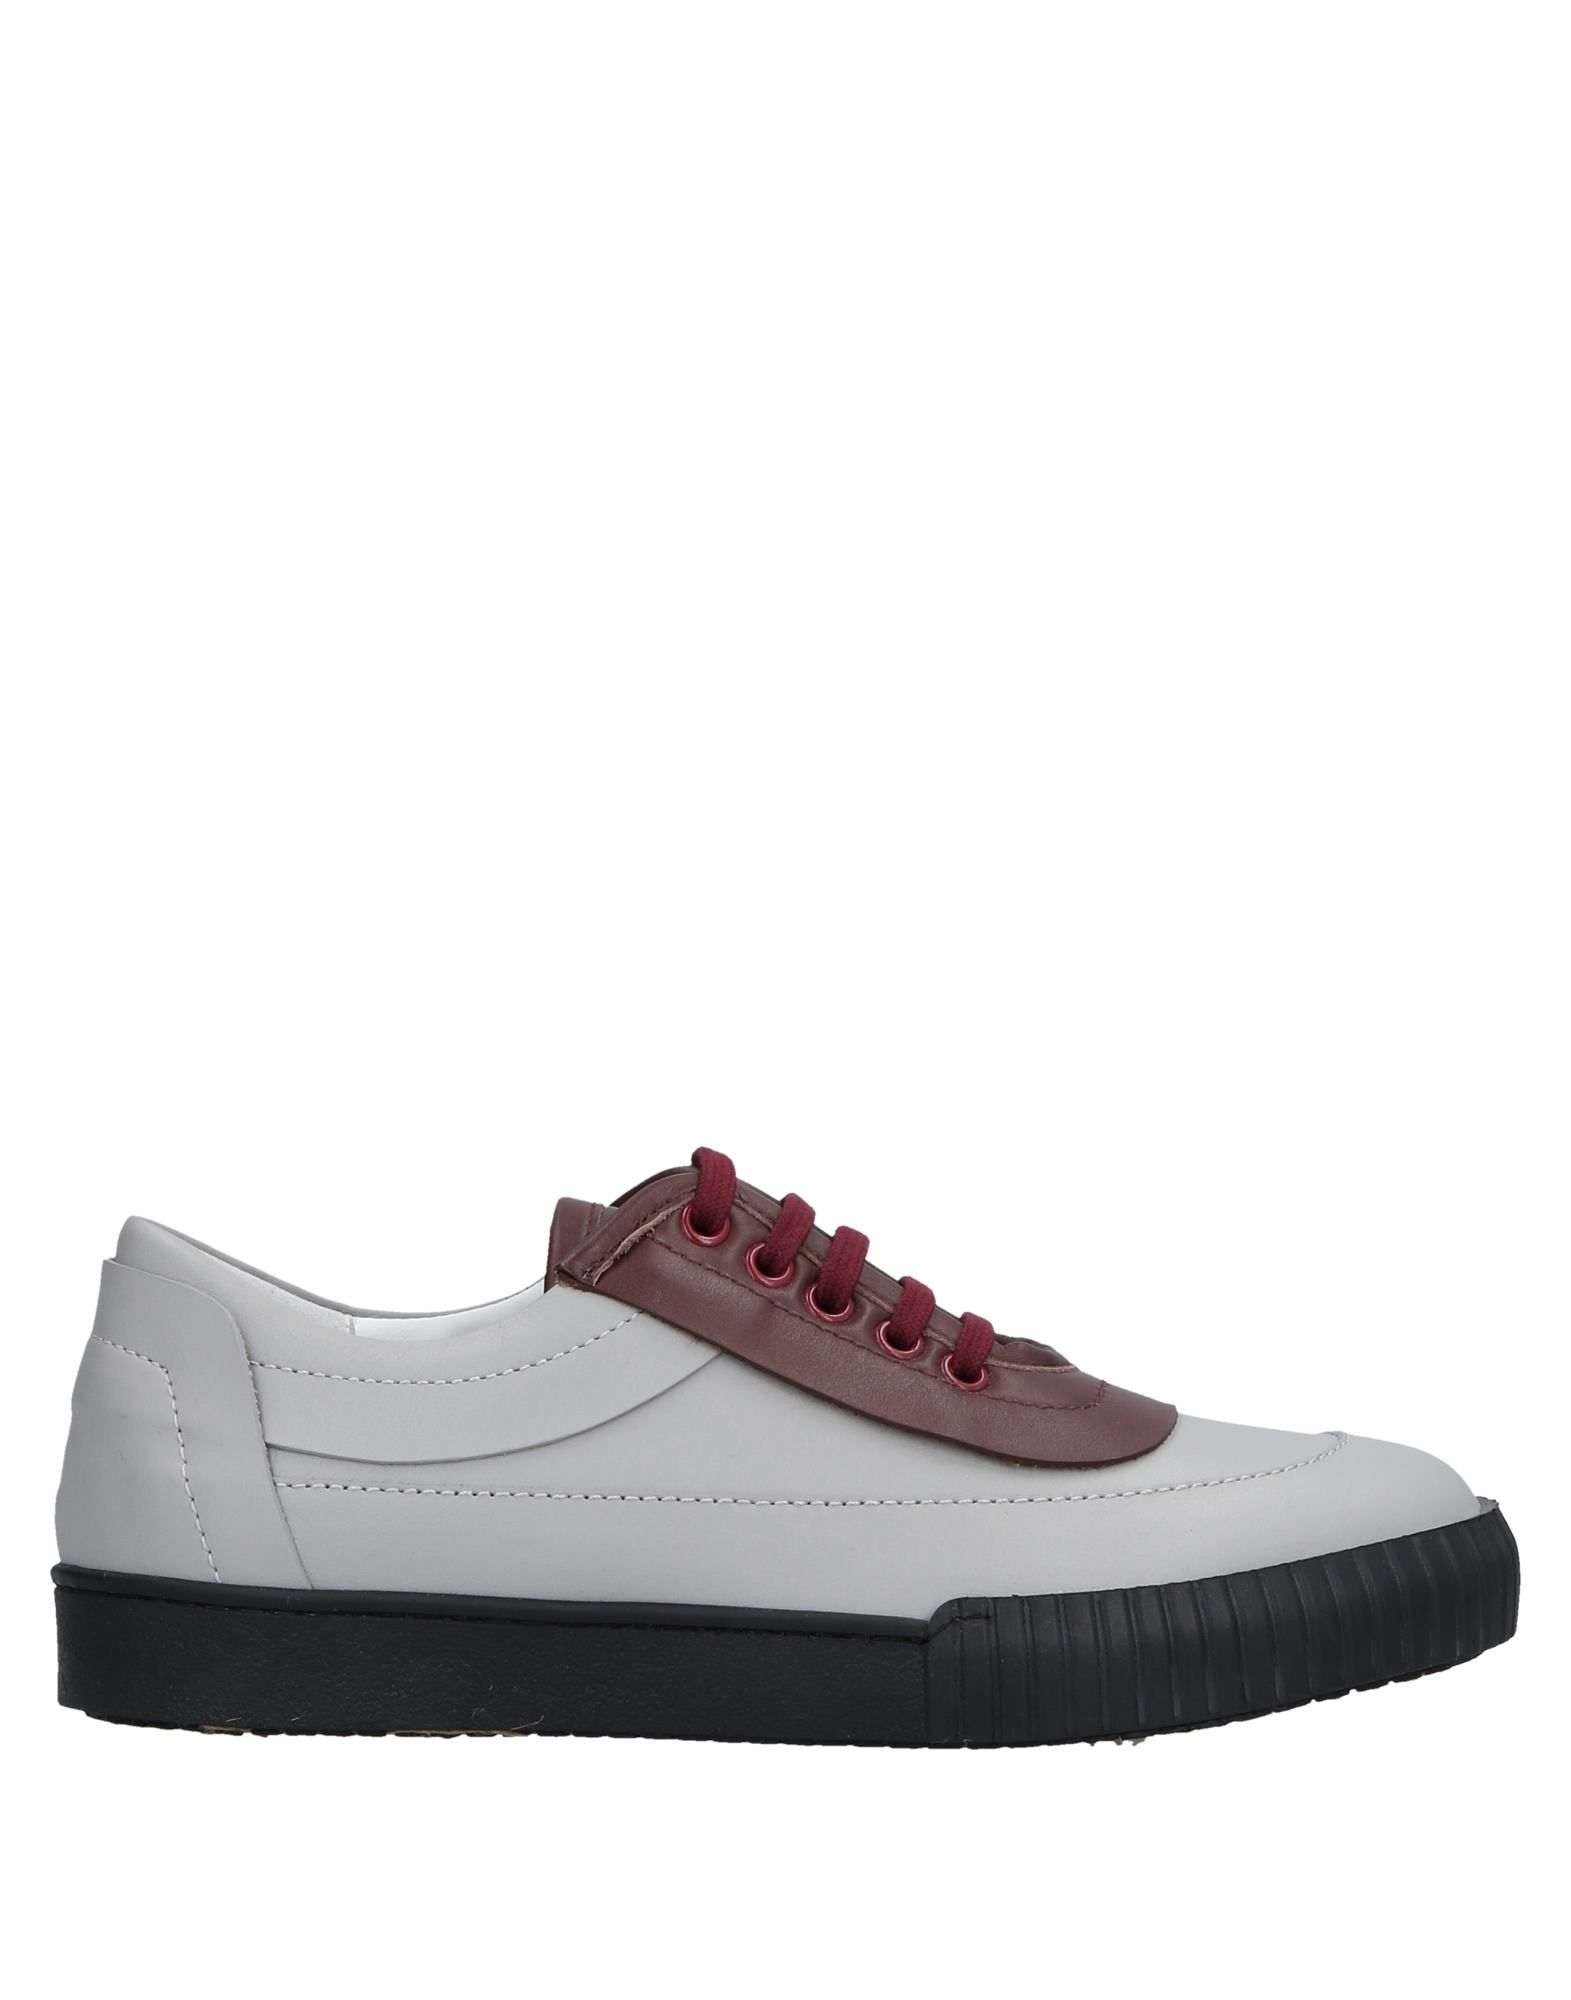 Marni Sneakers Herren  11537617BD Gute Qualität beliebte Schuhe